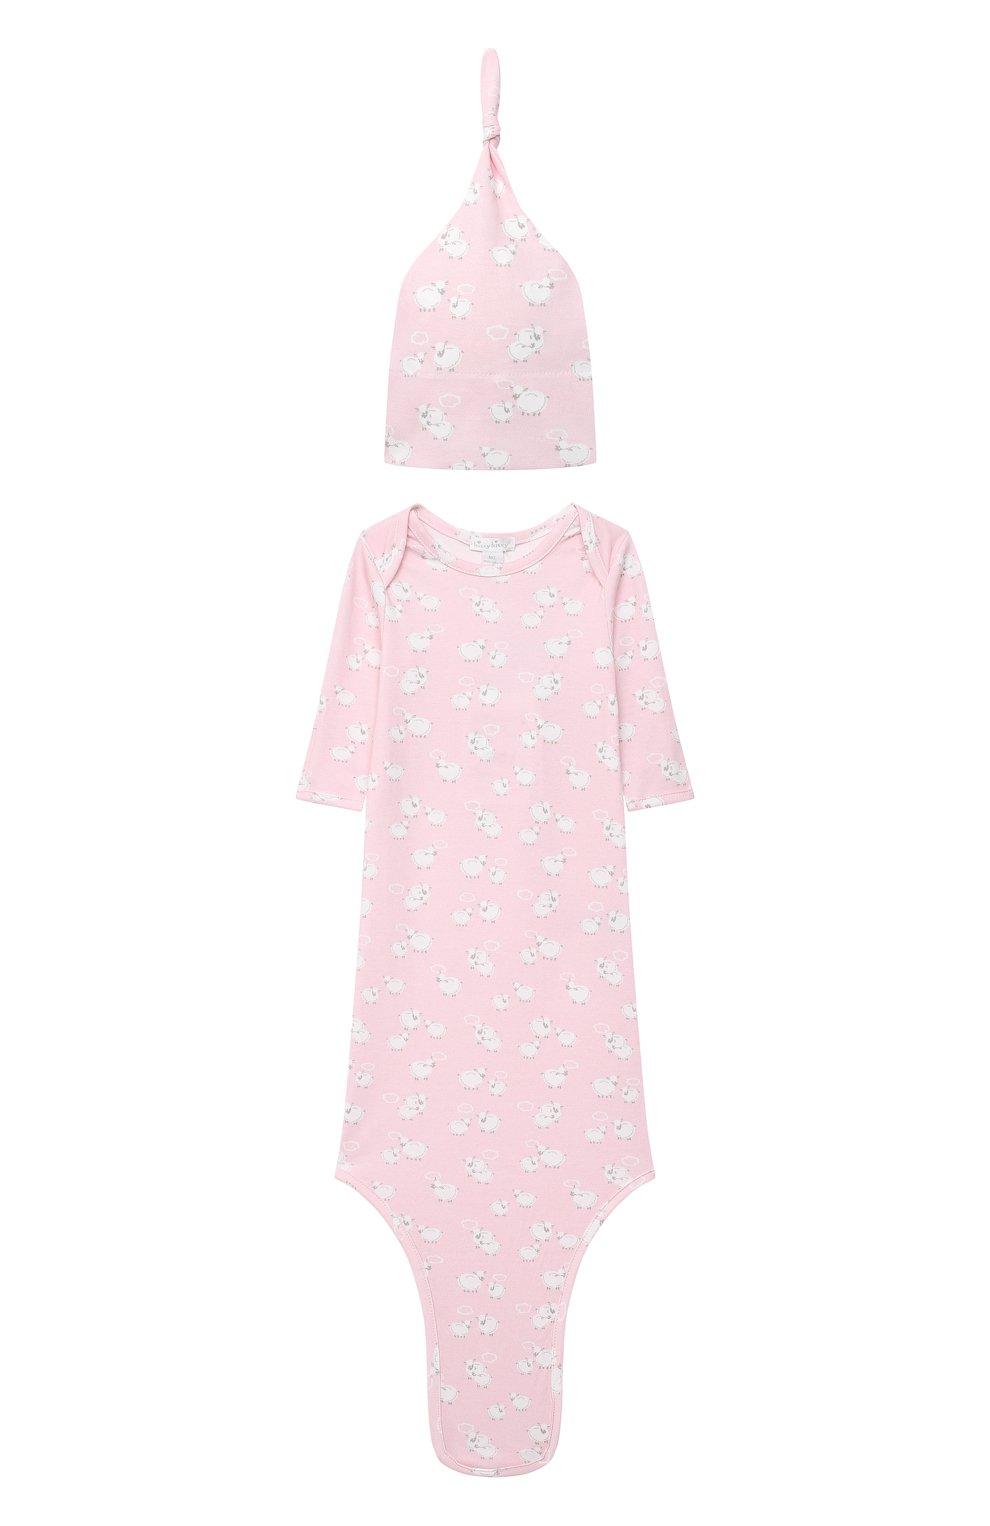 Детского комплект из платья на завязке и шапки KISSY KISSY розового цвета, арт. KGW05039N | Фото 1 (Материал внешний: Хлопок; Ростовка одежда: 0 - 3 мес | 50 - 60 см)